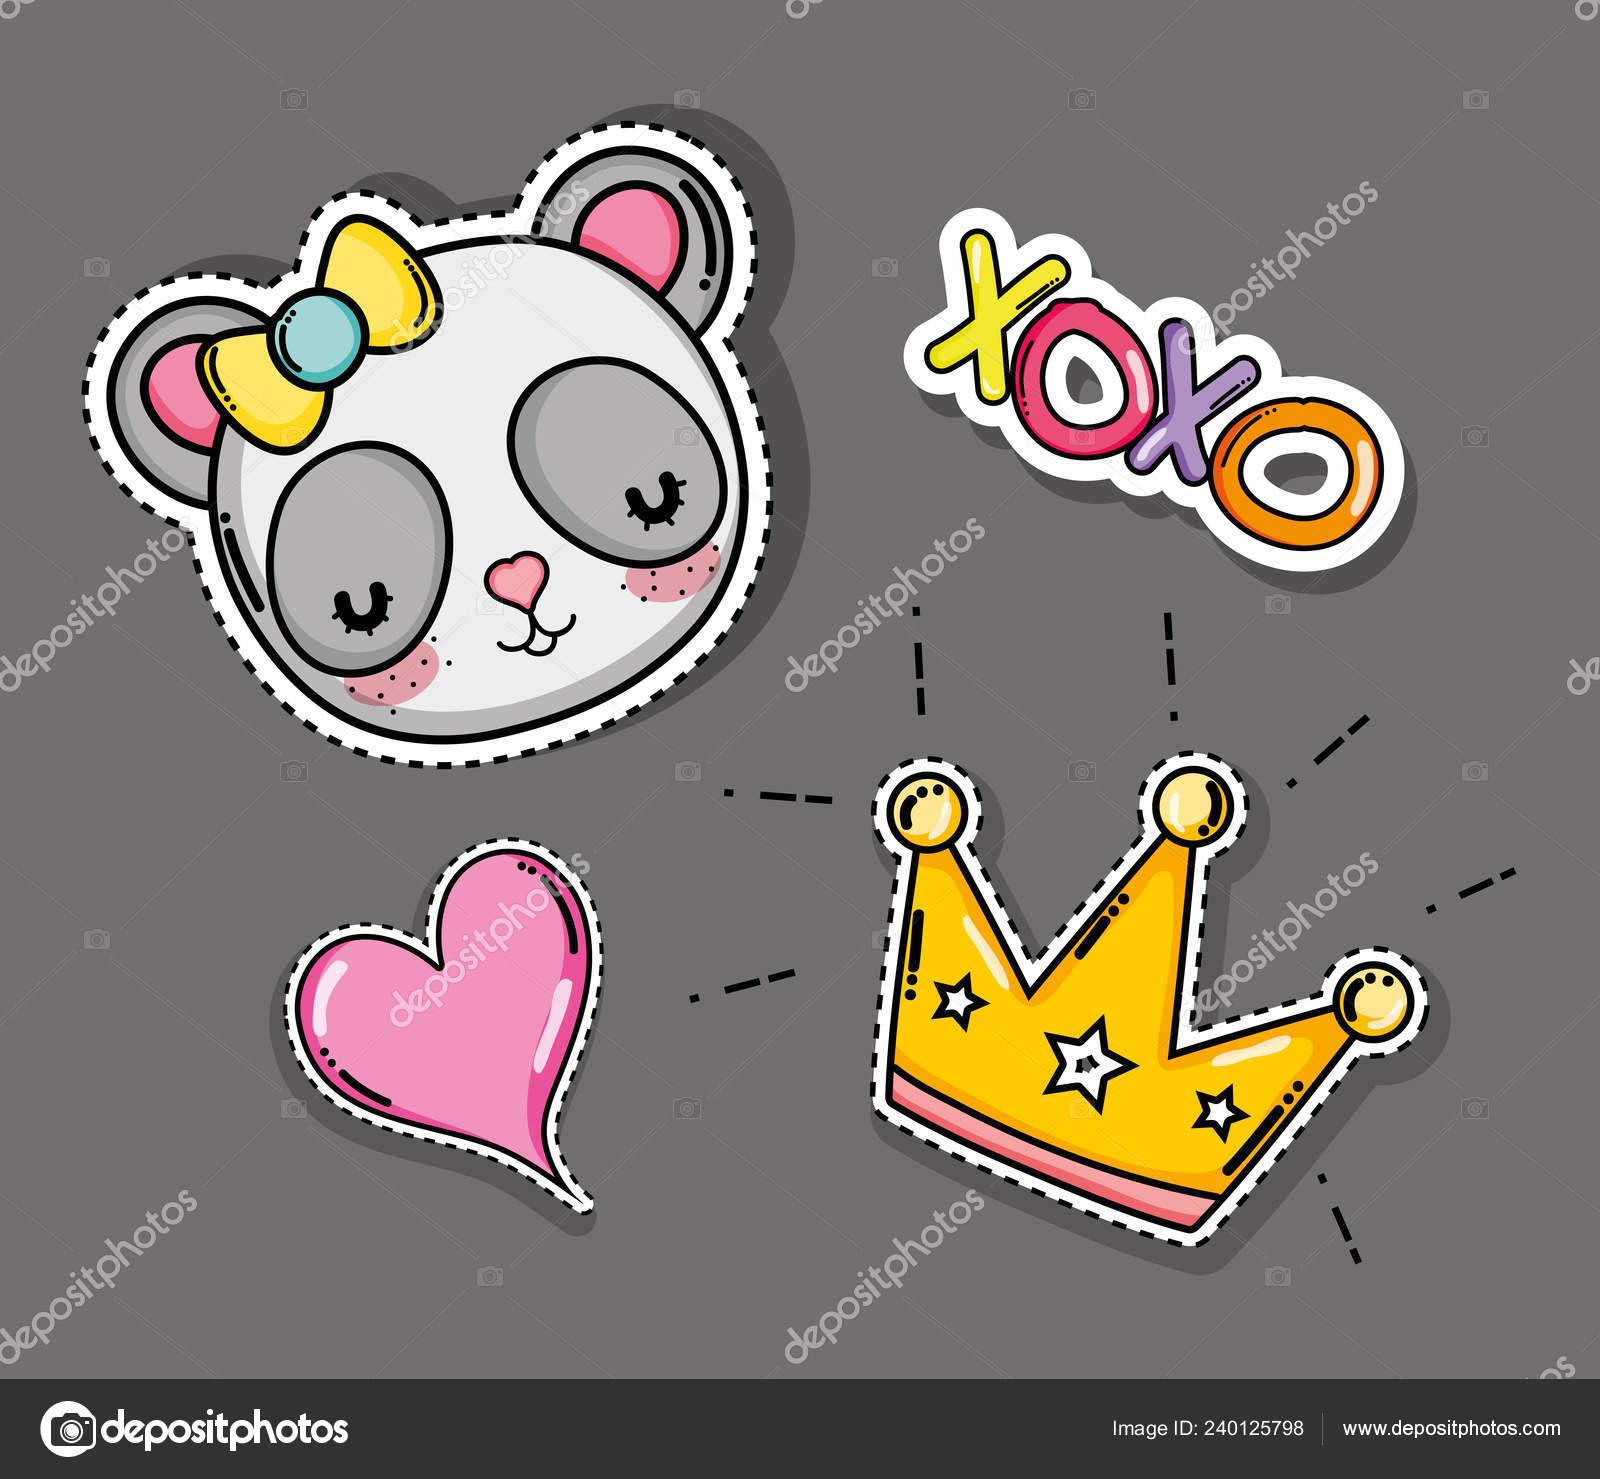 Cute Lovely Panda Heart Crown Cartoons Vector Illustration Graphic